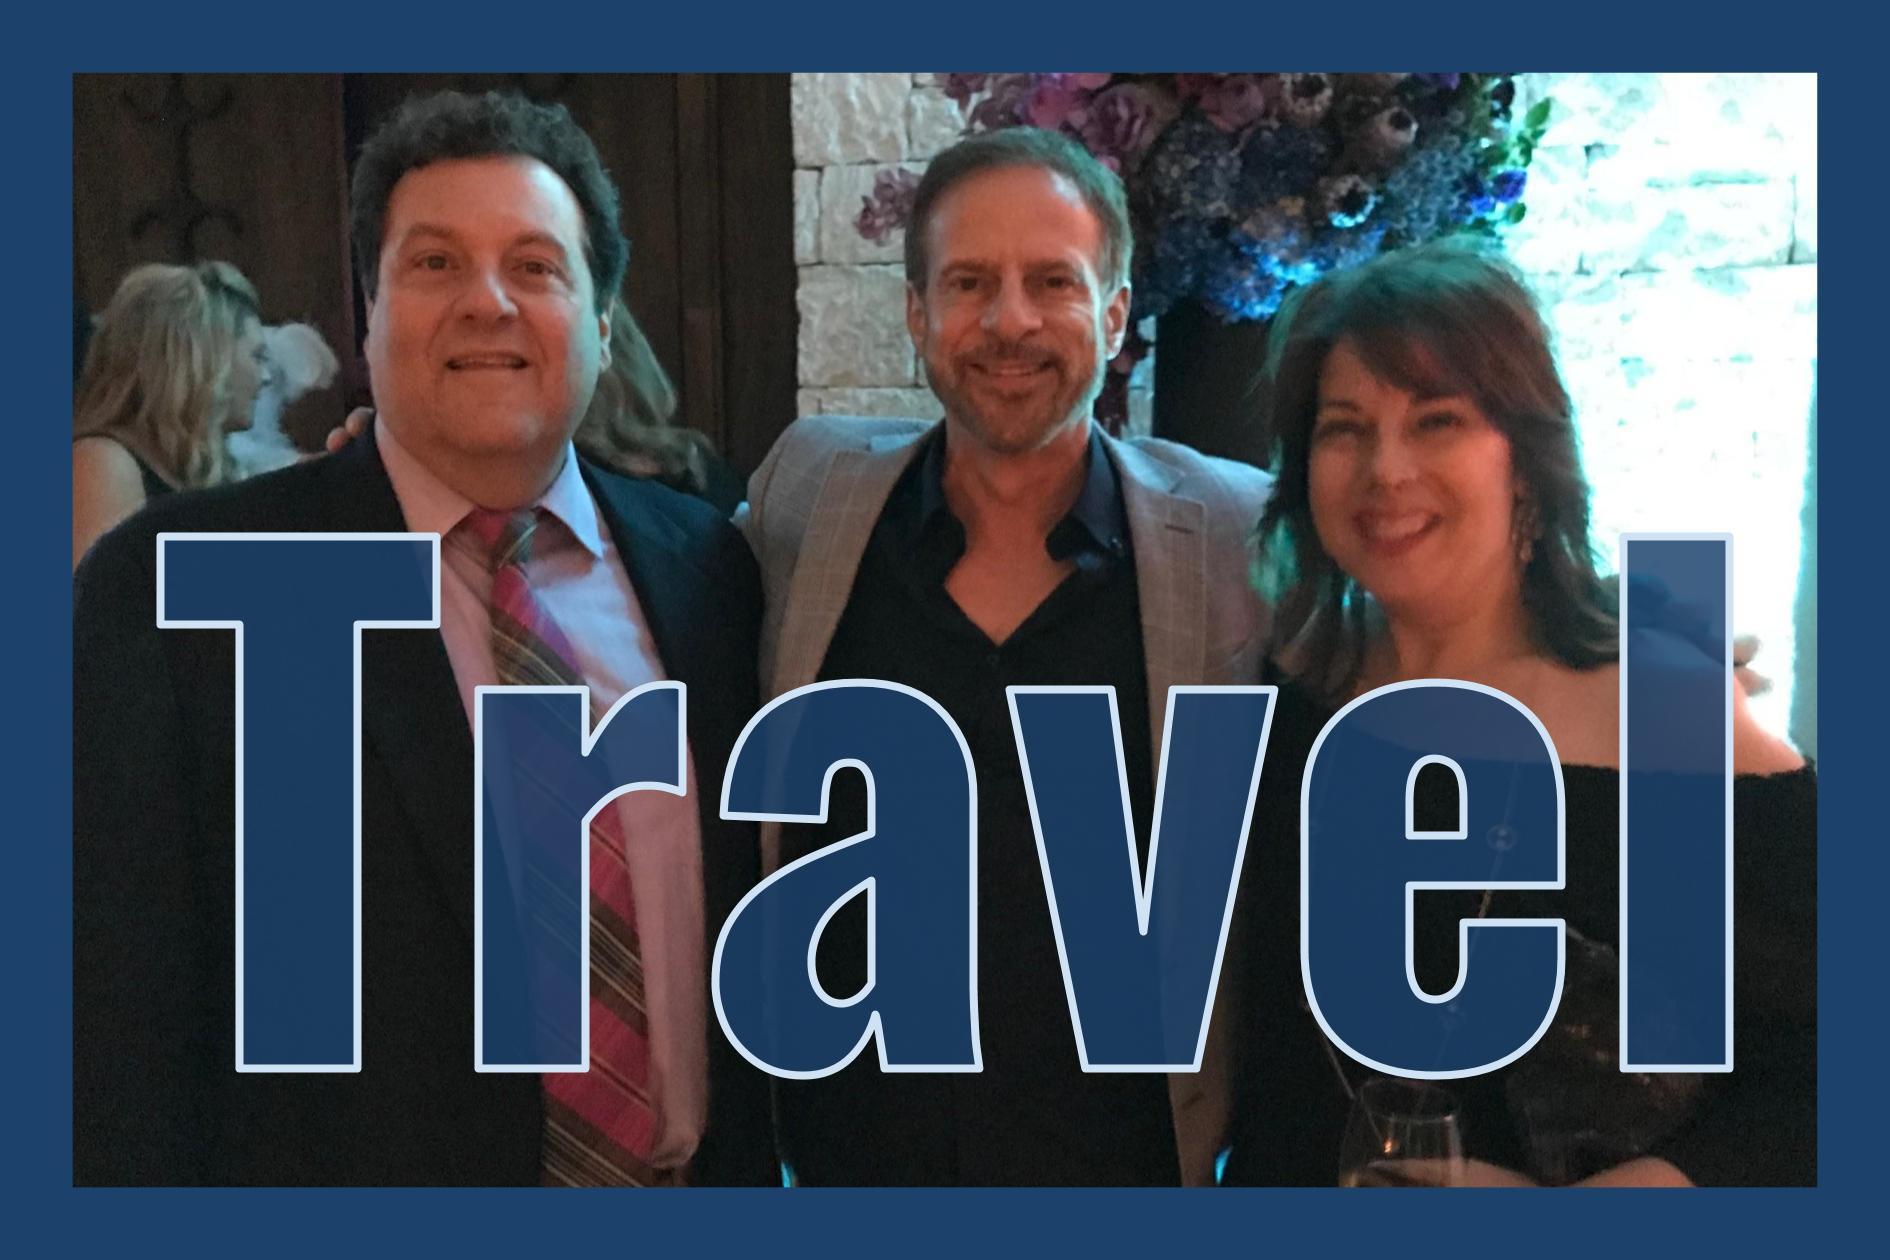 1Party Slate TWB Profile Meme - Travel